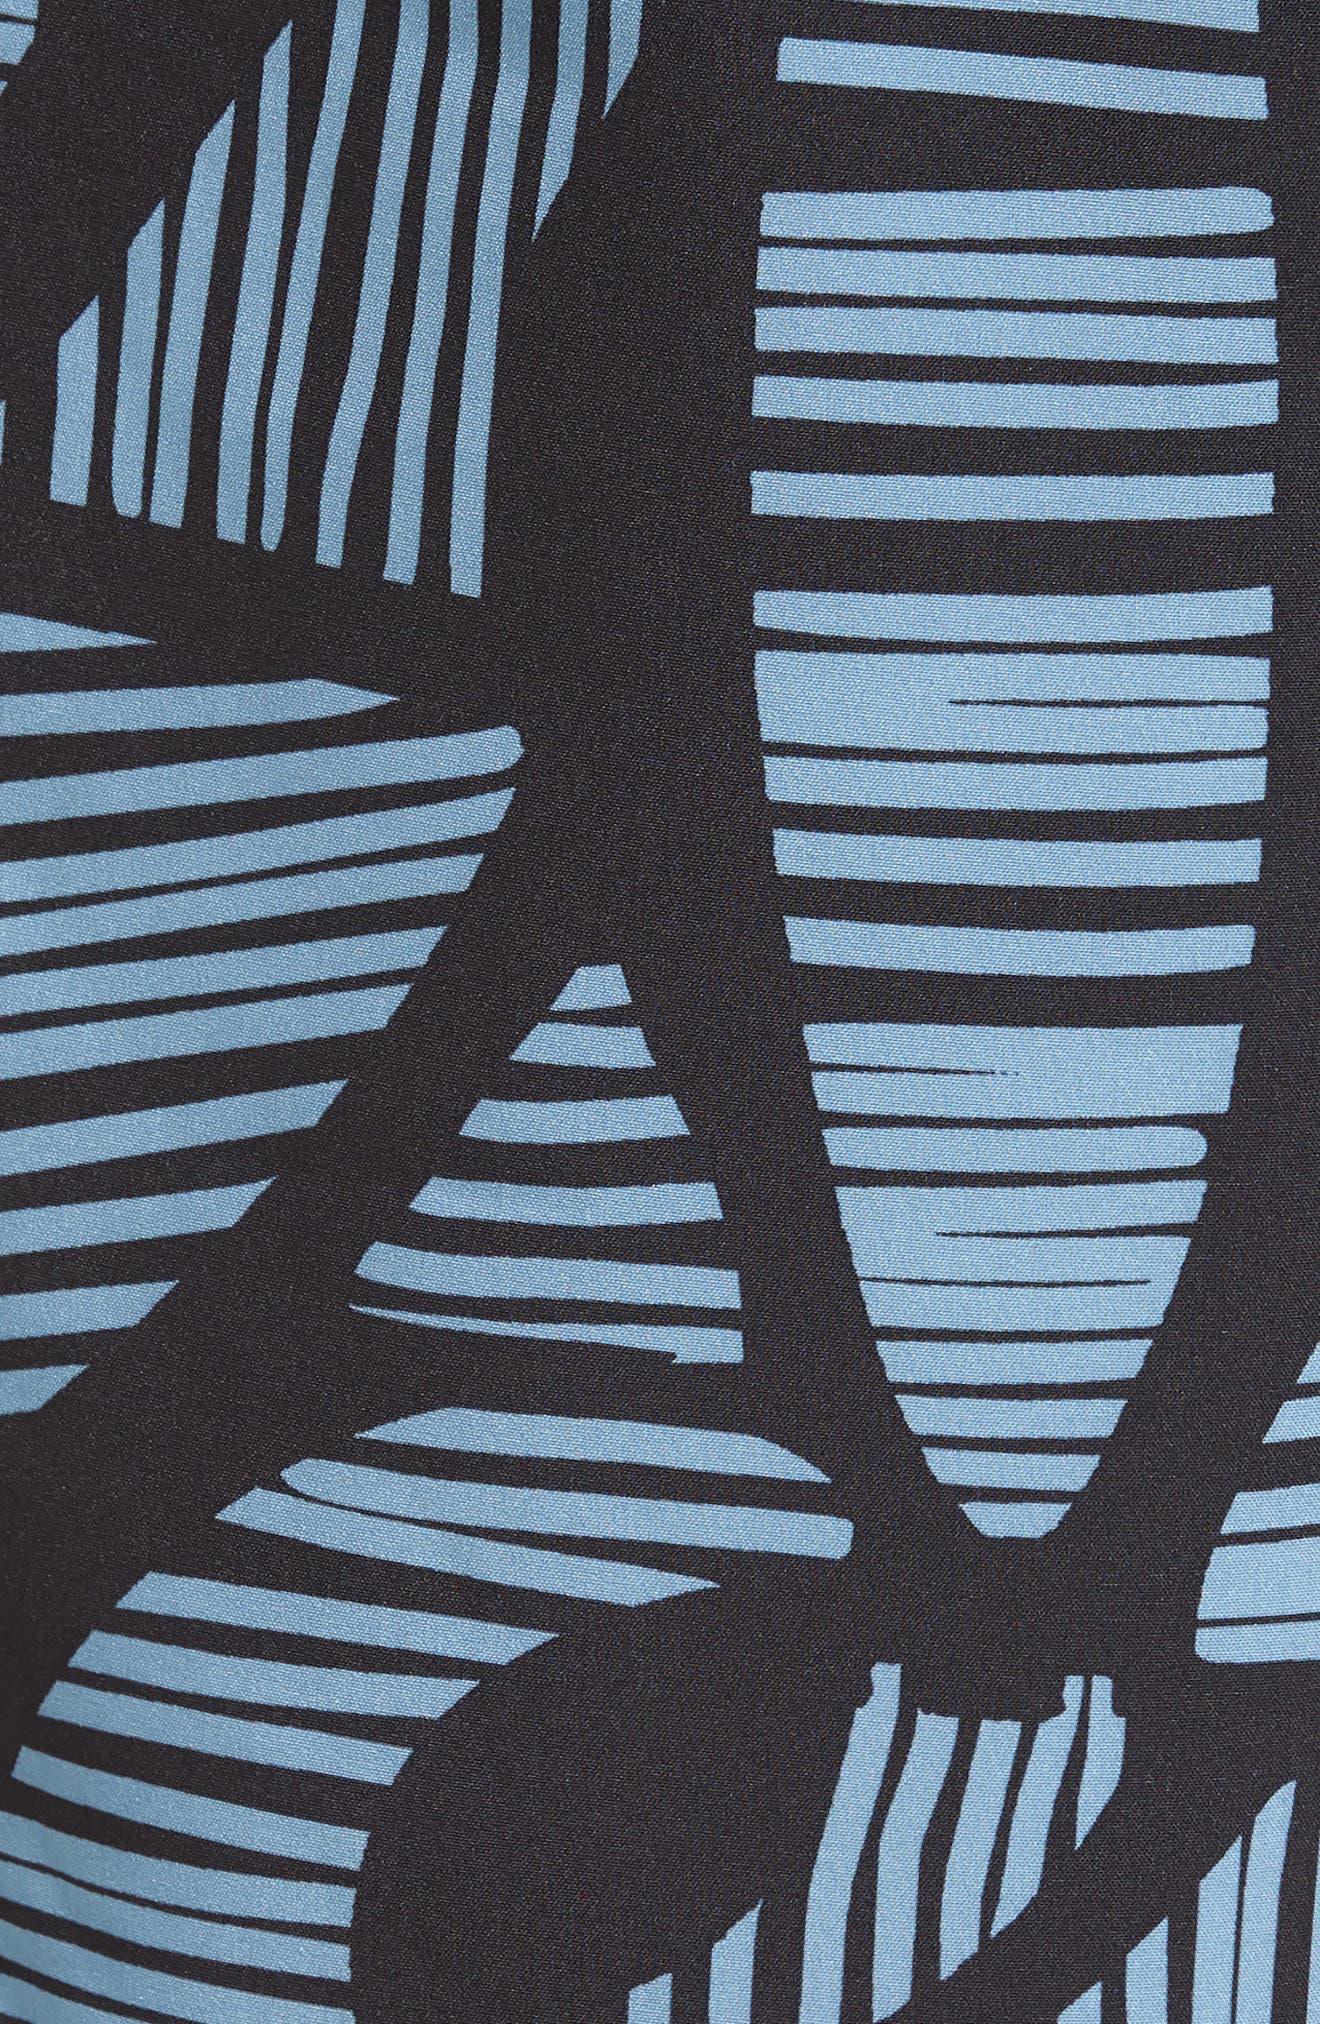 Odysea Board Shorts,                             Alternate thumbnail 4, color,                             Black